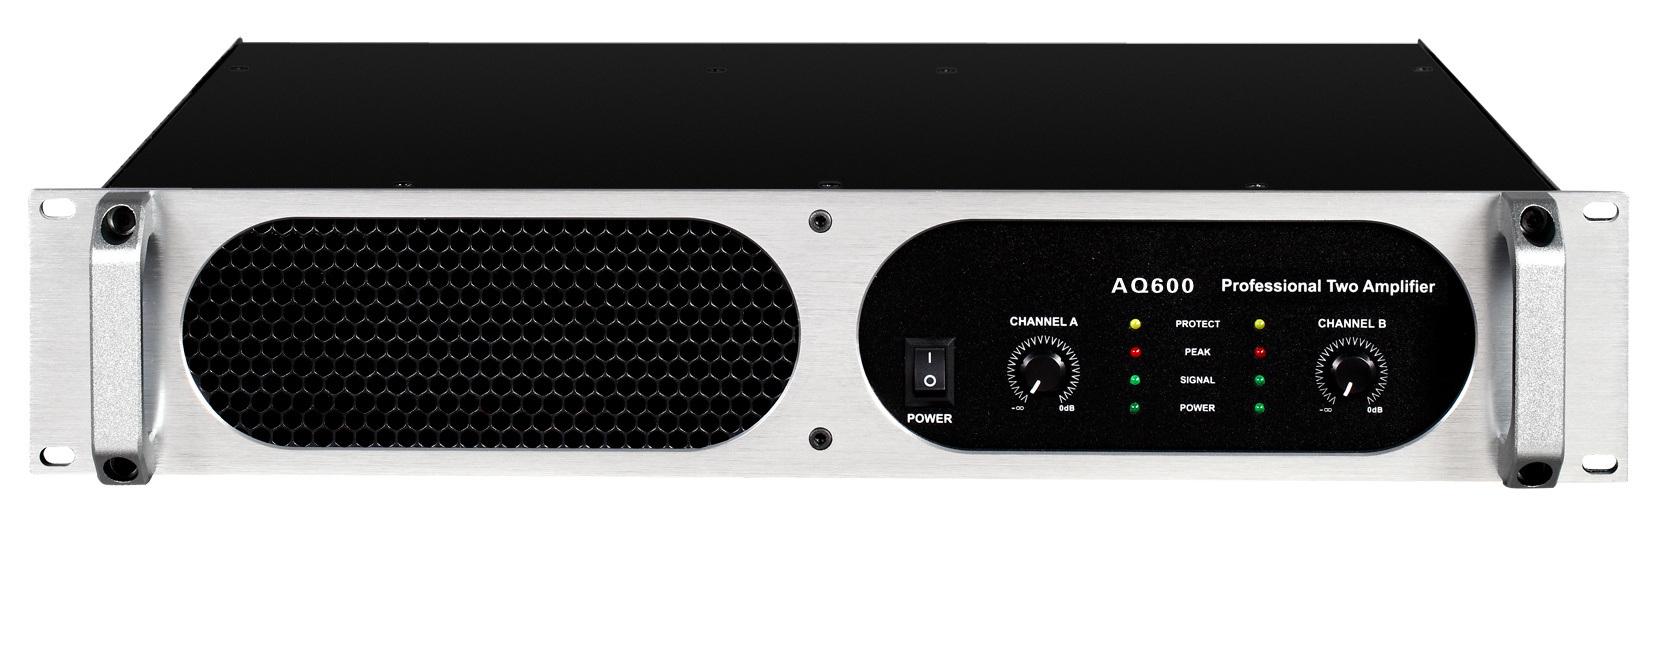 QA Series, 2 Channels Professional Power Amplifier 2u Standard Cabinet